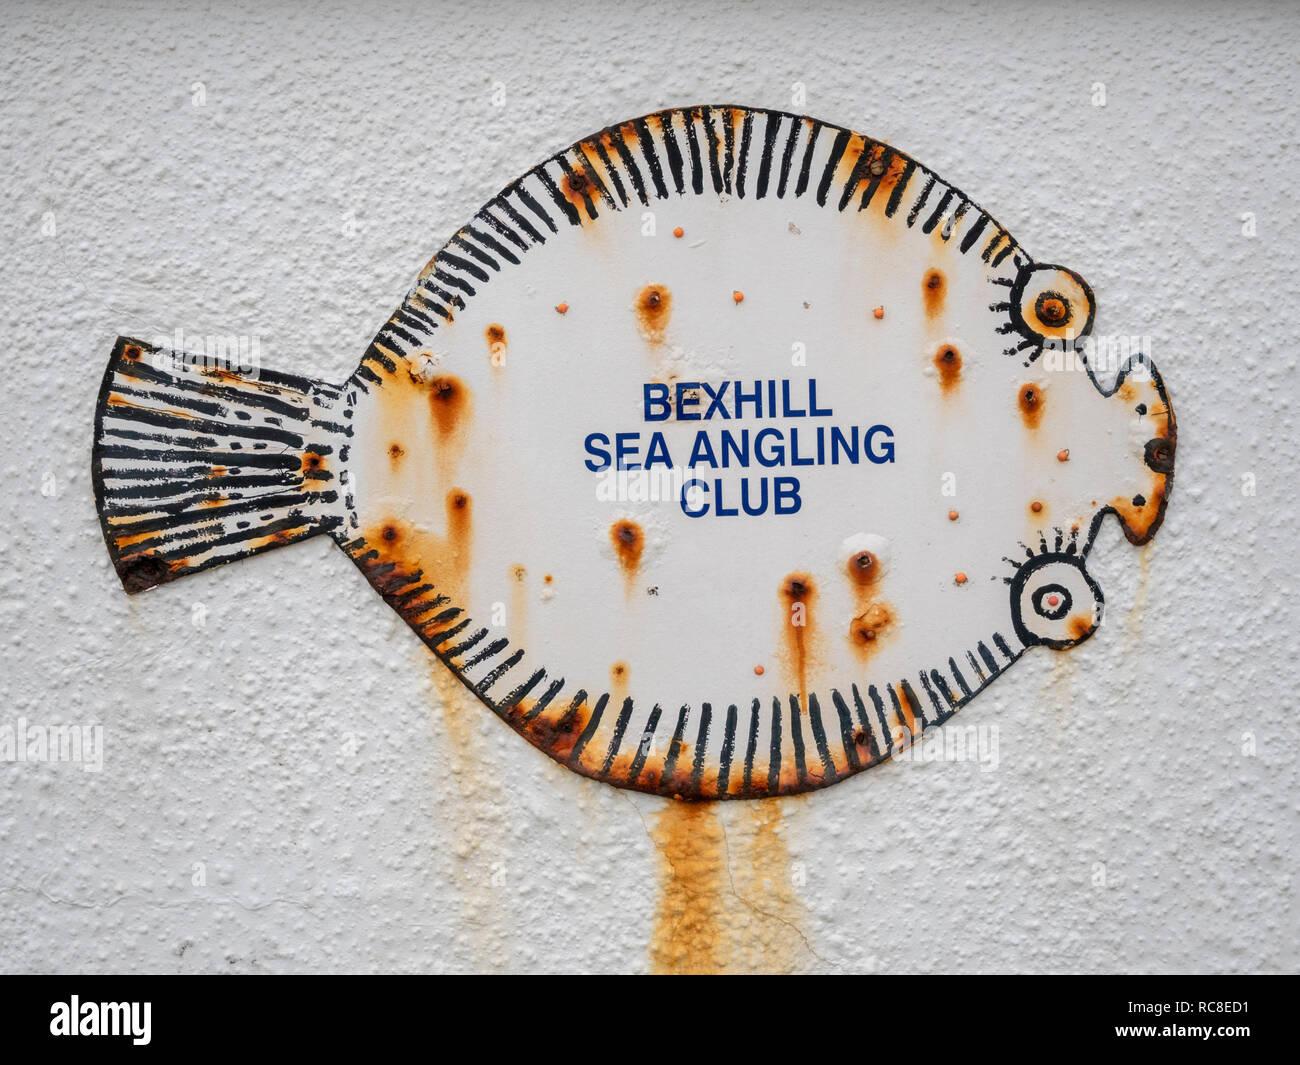 Un cartel en la forma de un pez en una pared en Bexhill Mar angulable Club Bexhill East Sussex, UK Imagen De Stock